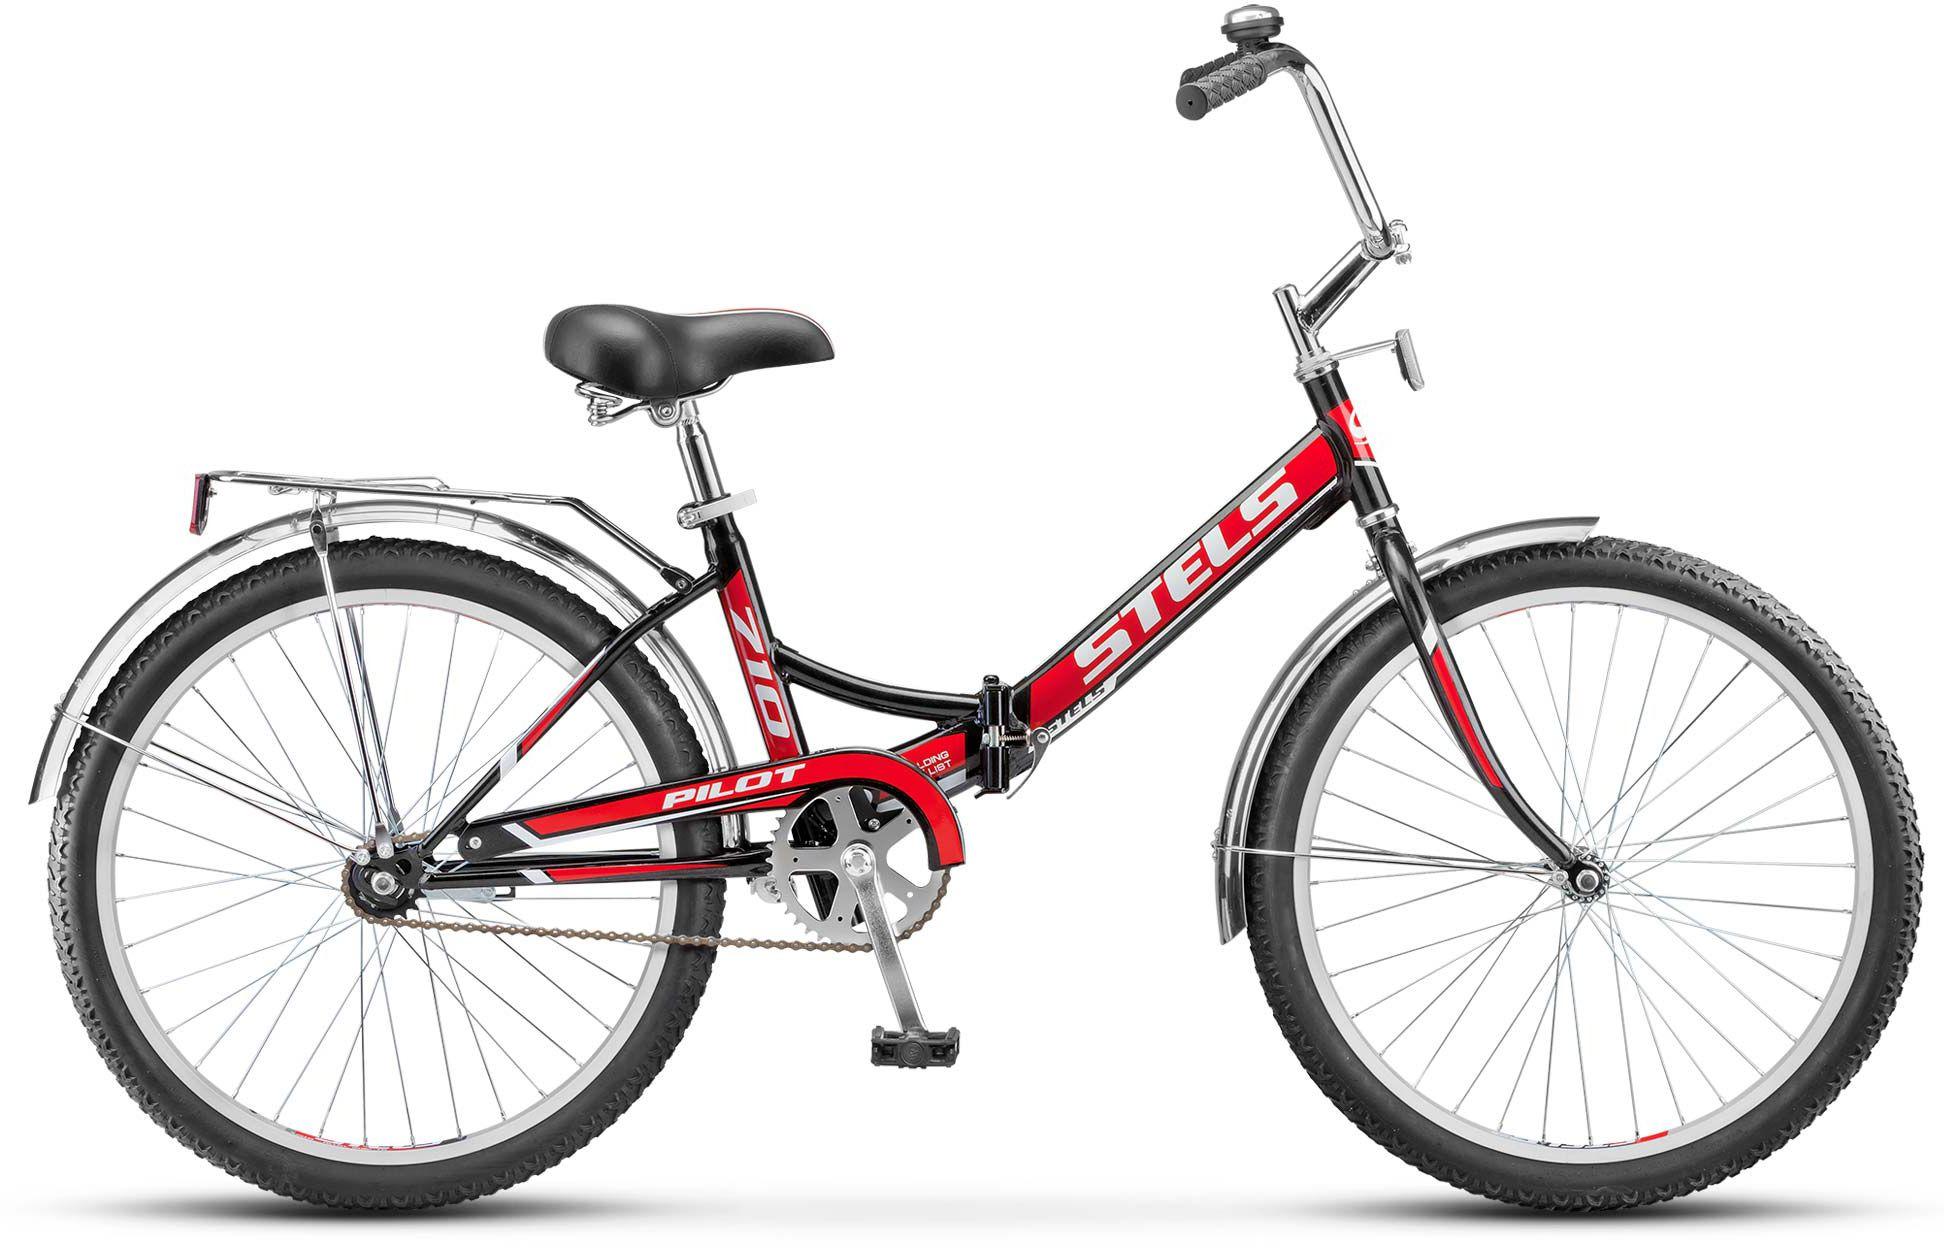 Велосипед Stels Pilot 710 24 2017 stels pilot 710 24 рама 16 белый синий